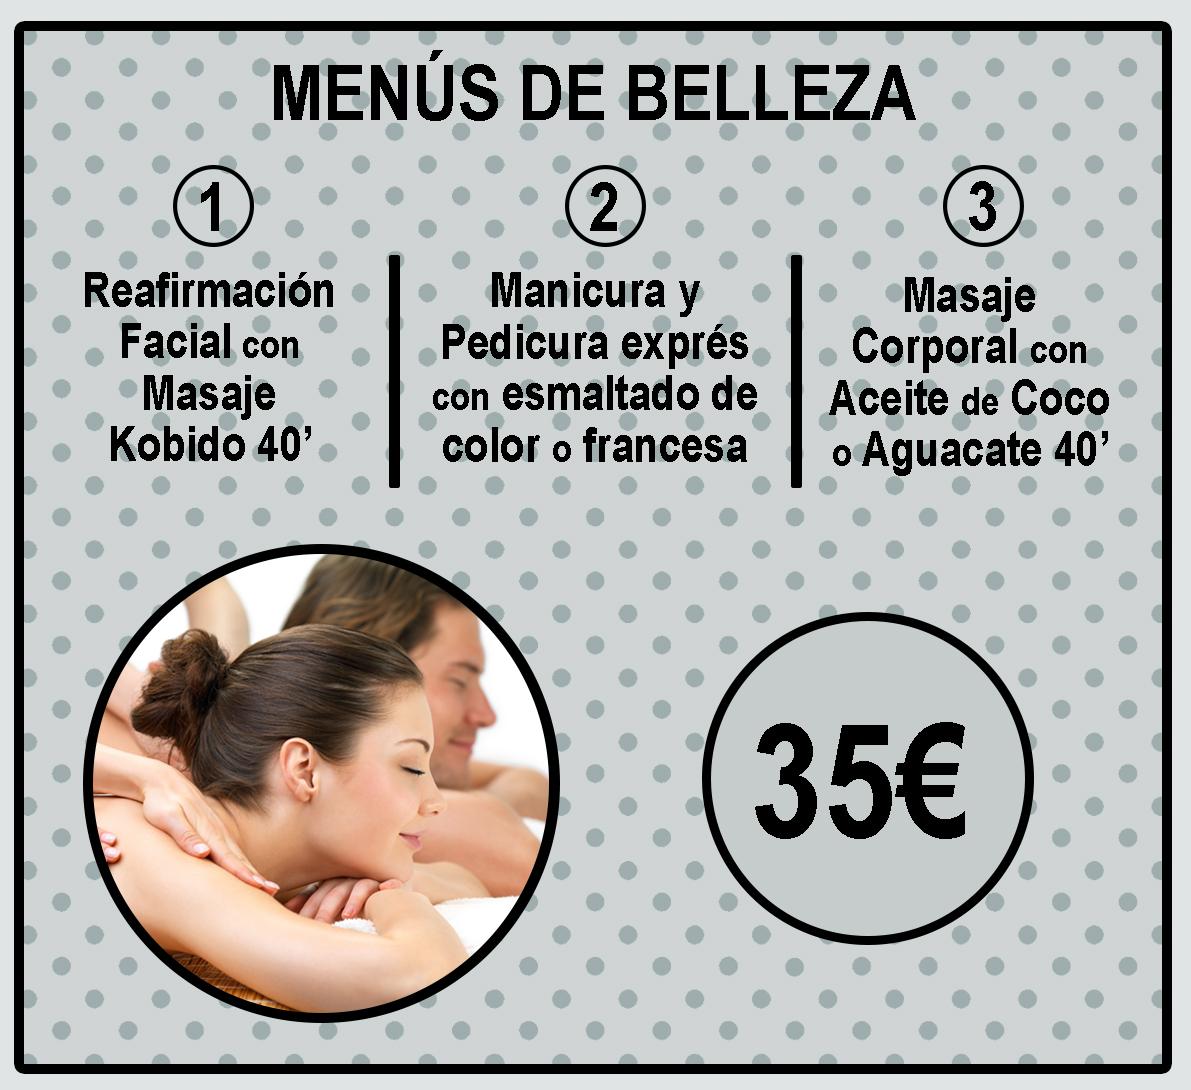 MENU DE BELLEZA NEGRO